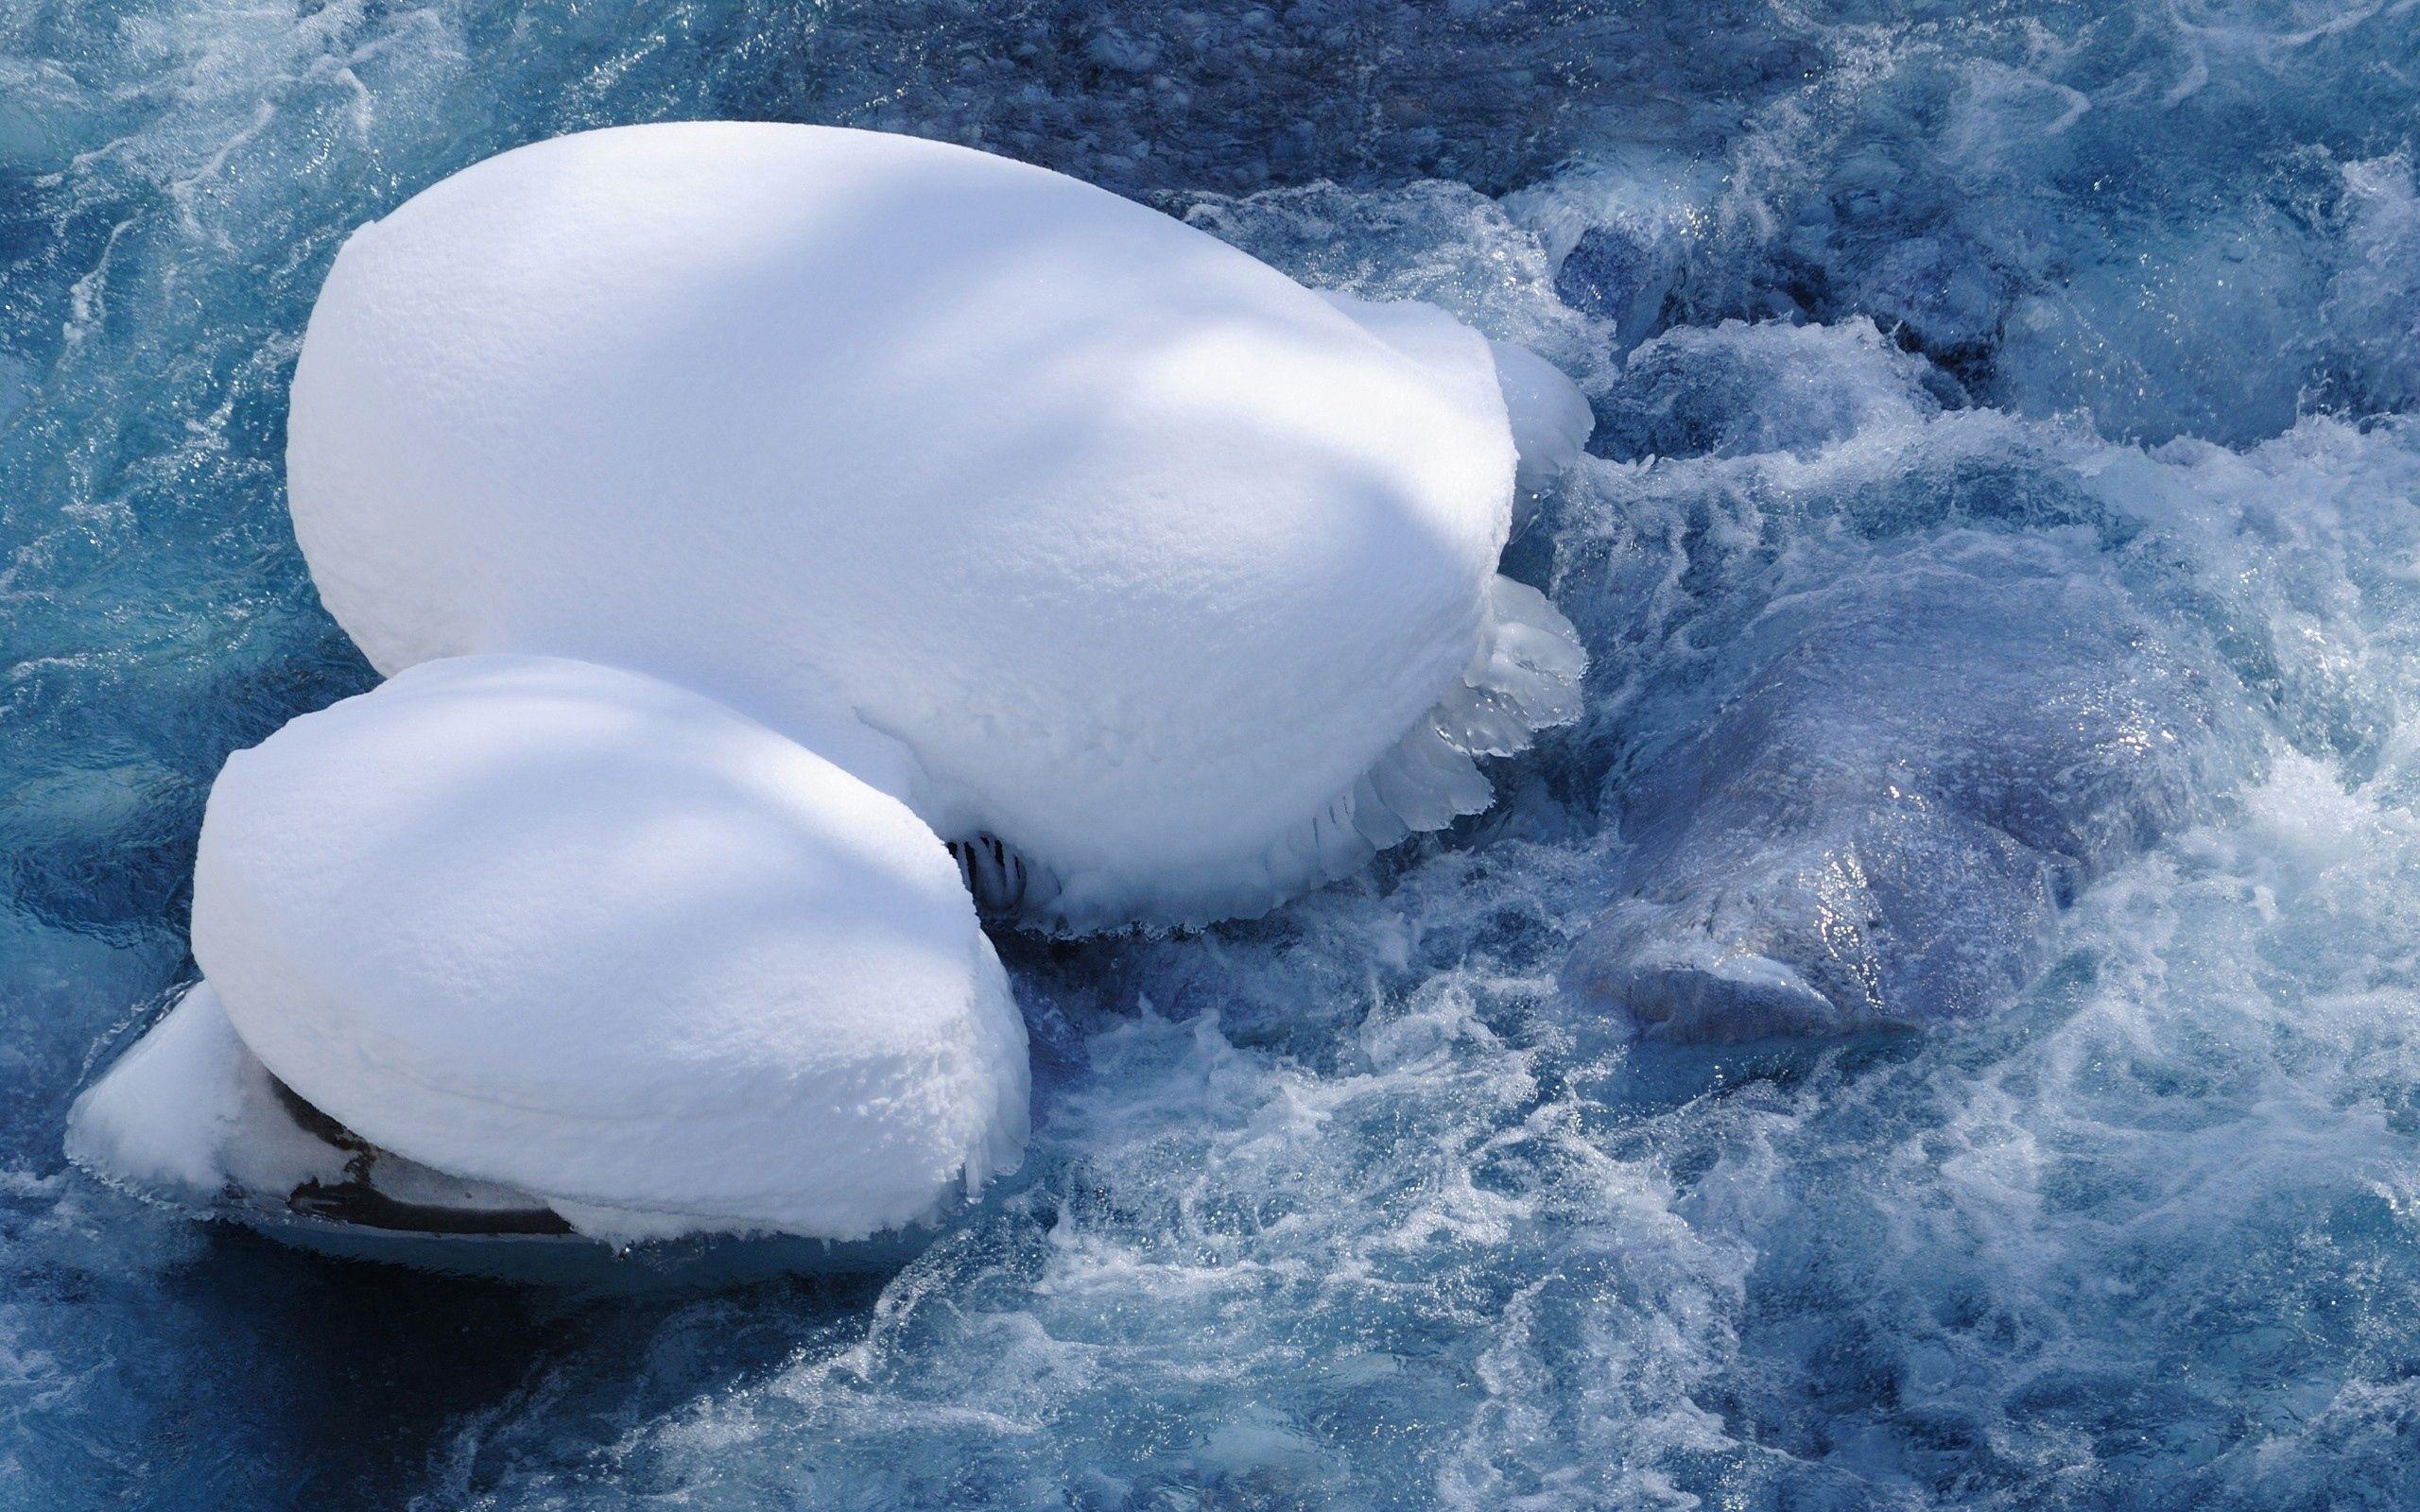 136213 Заставки и Обои Лед на телефон. Скачать Лед, Природа, Вода, Снег картинки бесплатно